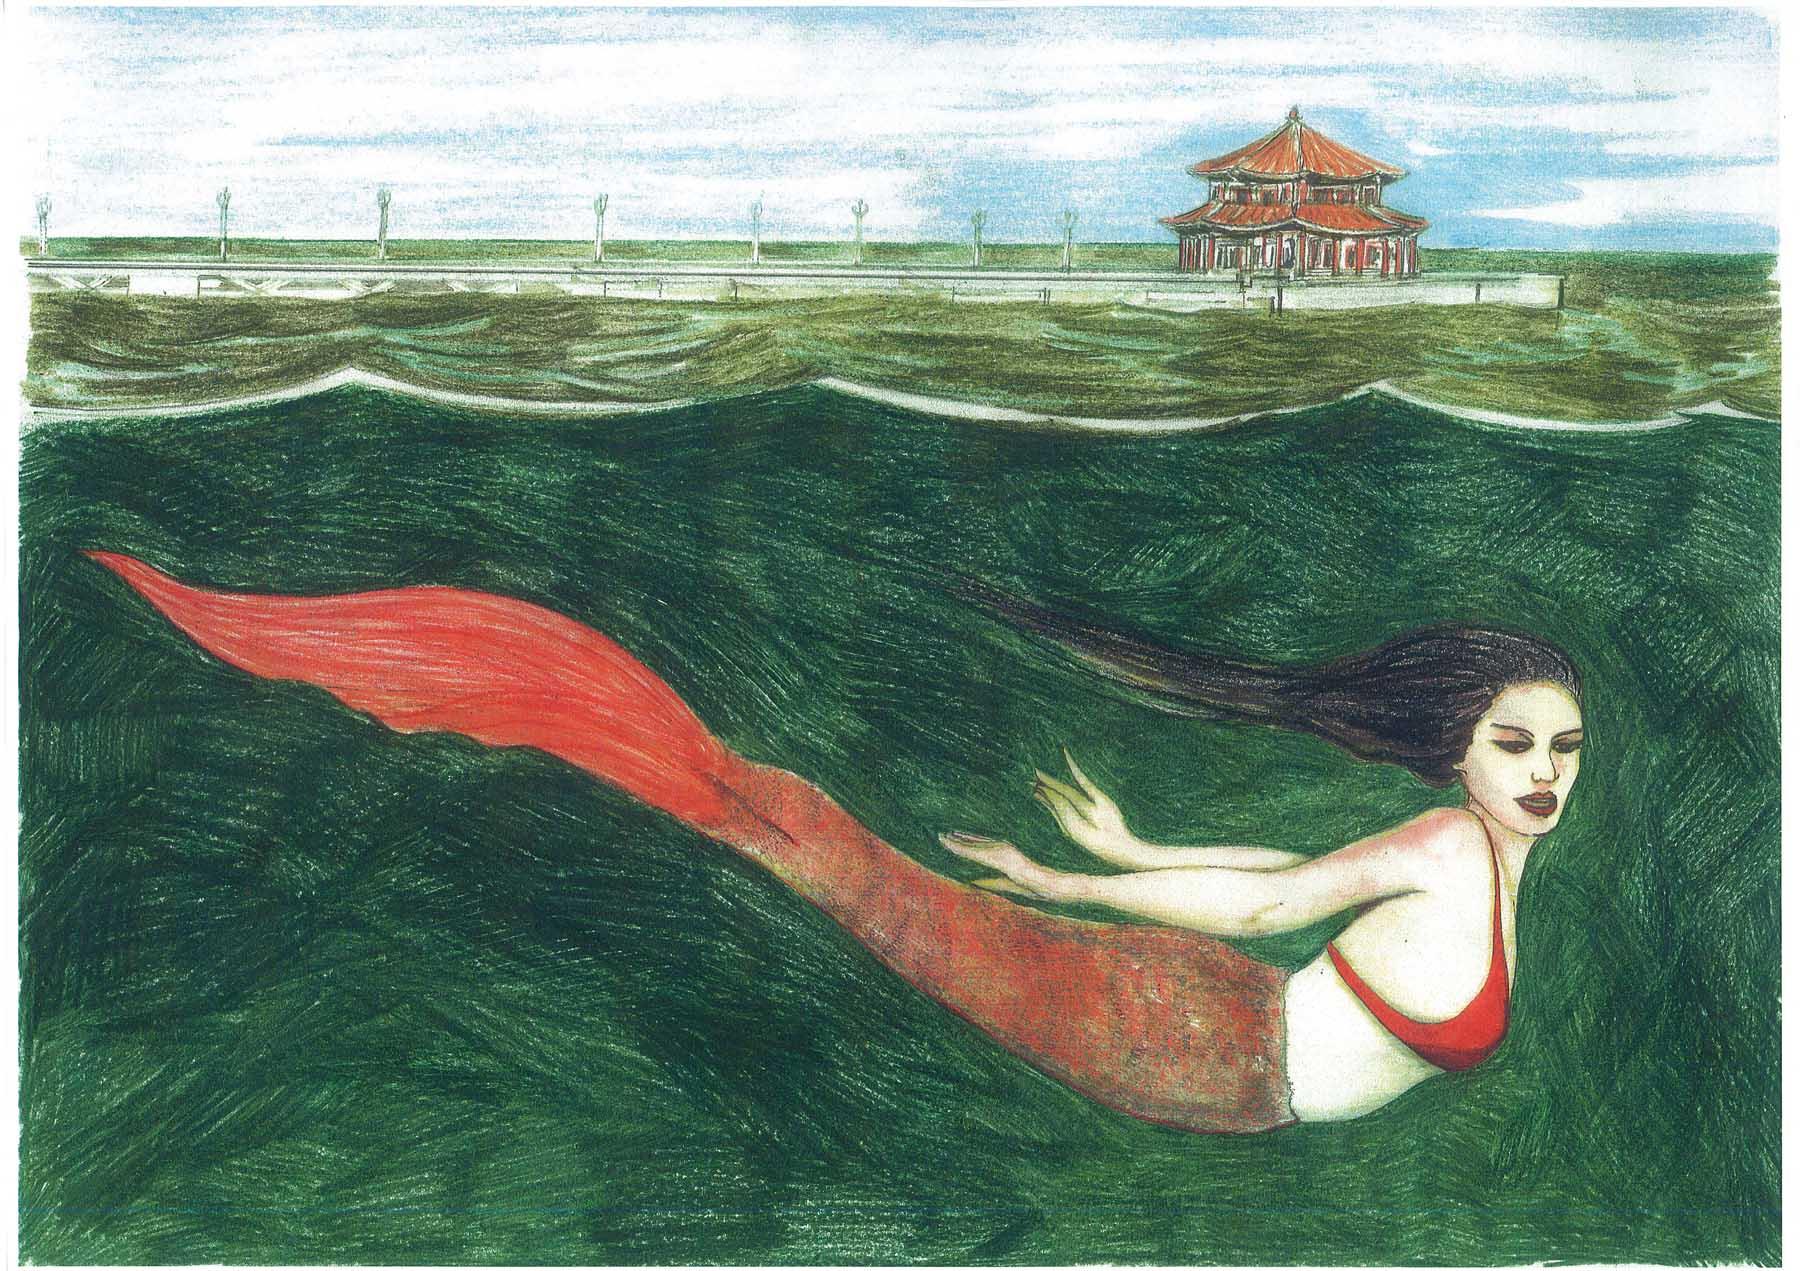 Qingdao China Mermaid.jpg